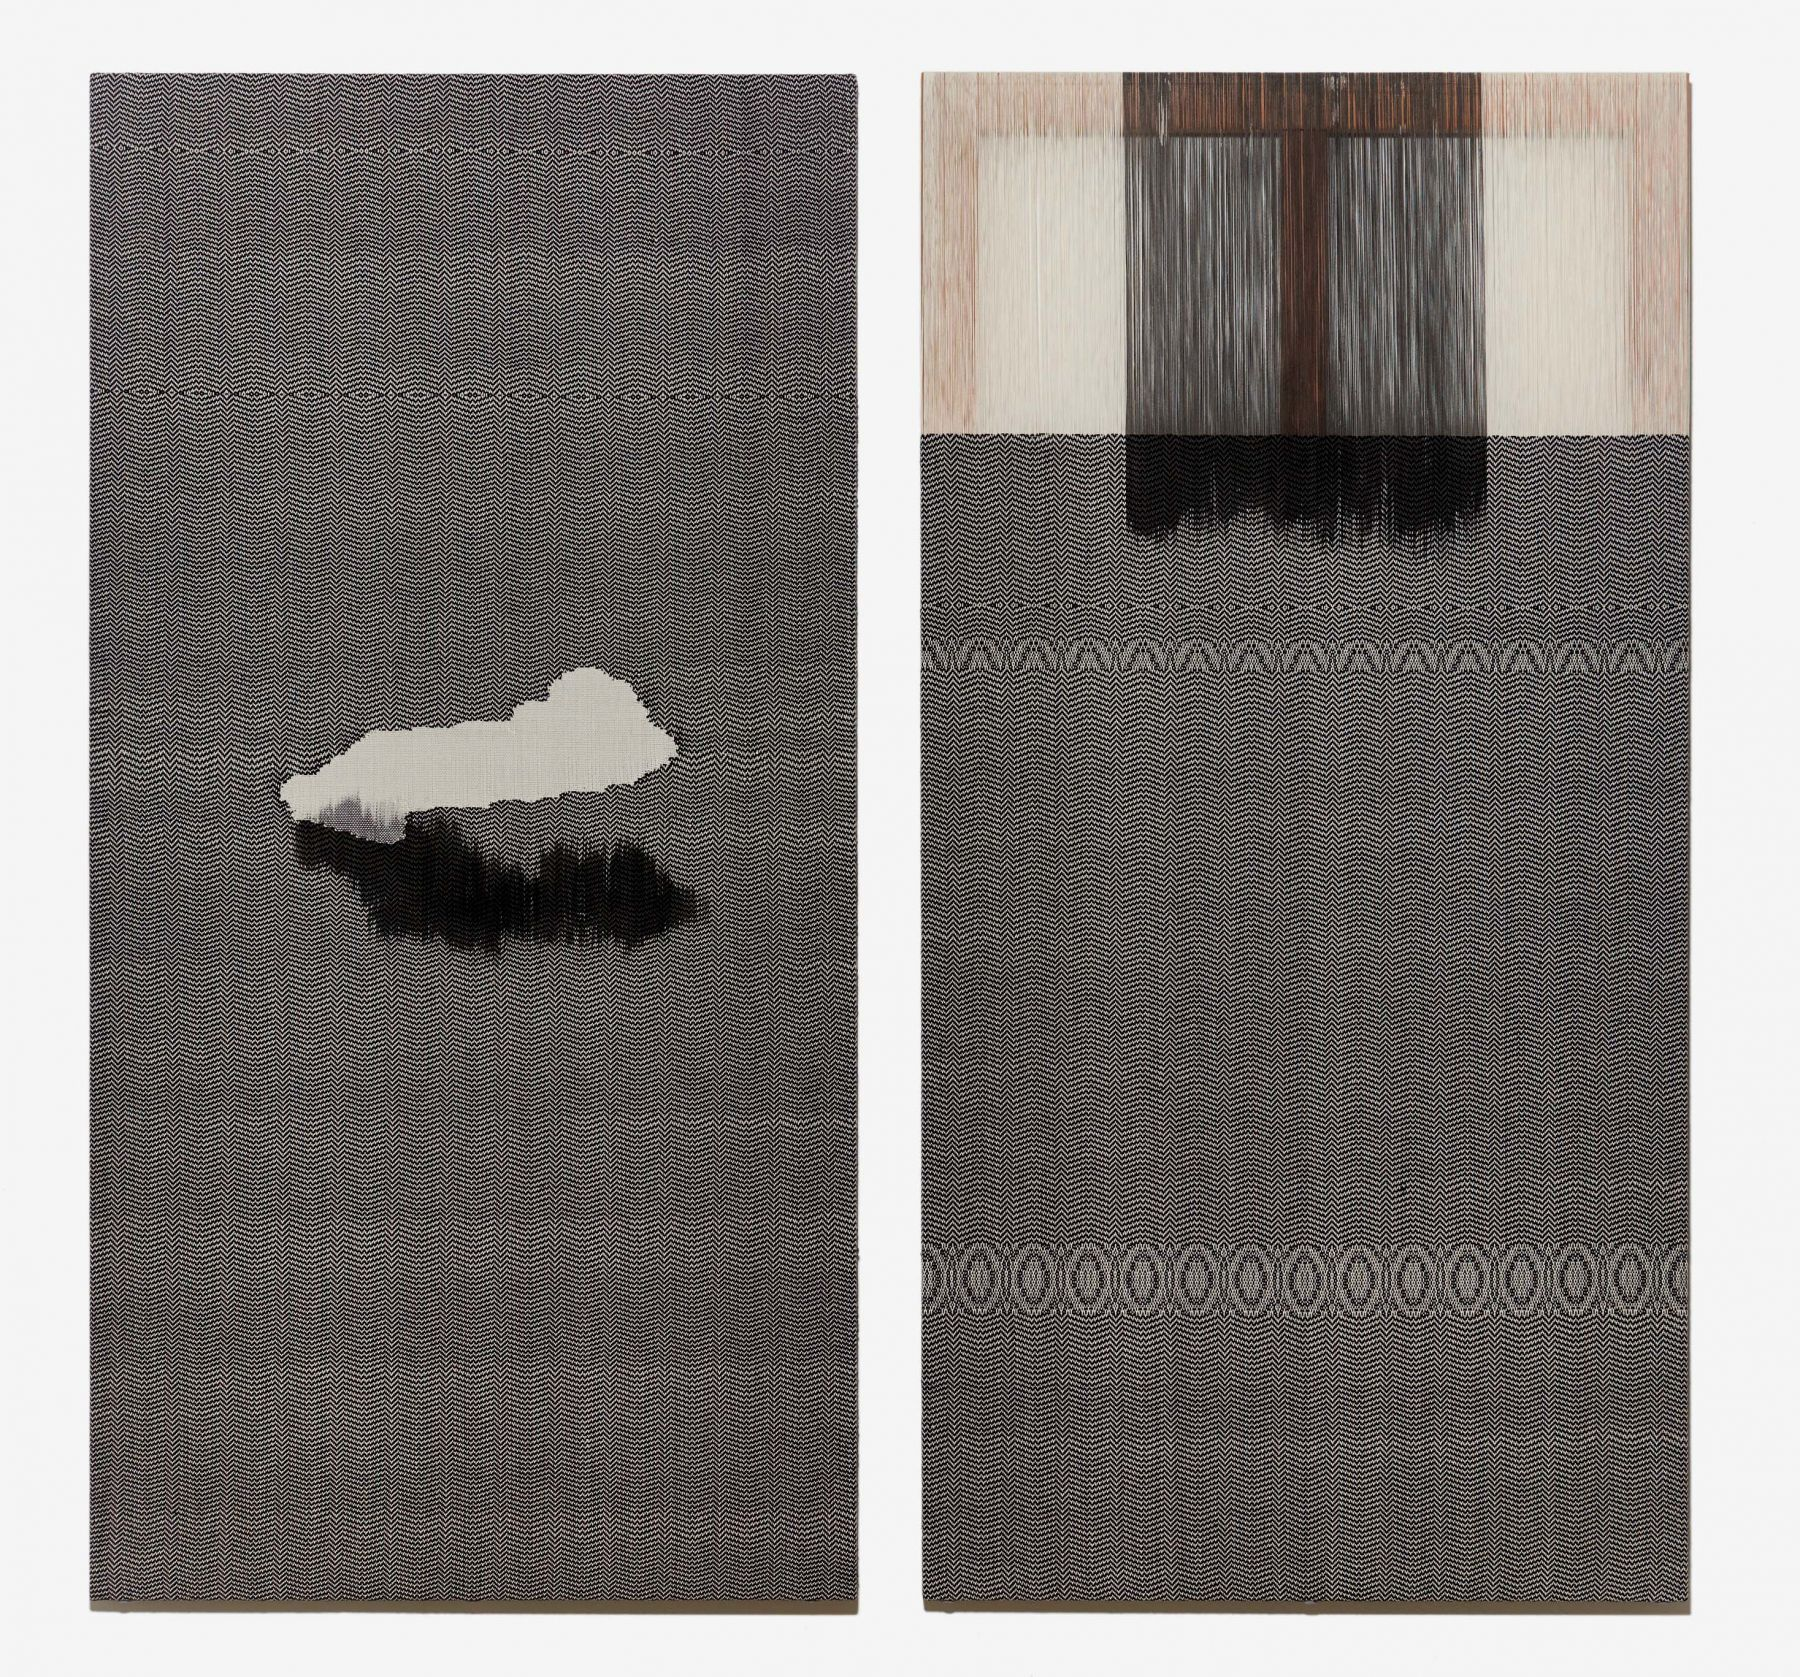 CHA Seungean, Holy day-2,3 (diptych), 2015, cotton yarn, polyester yarn, dye, 194 x 97 cm / 76.38 x 38.20 in.